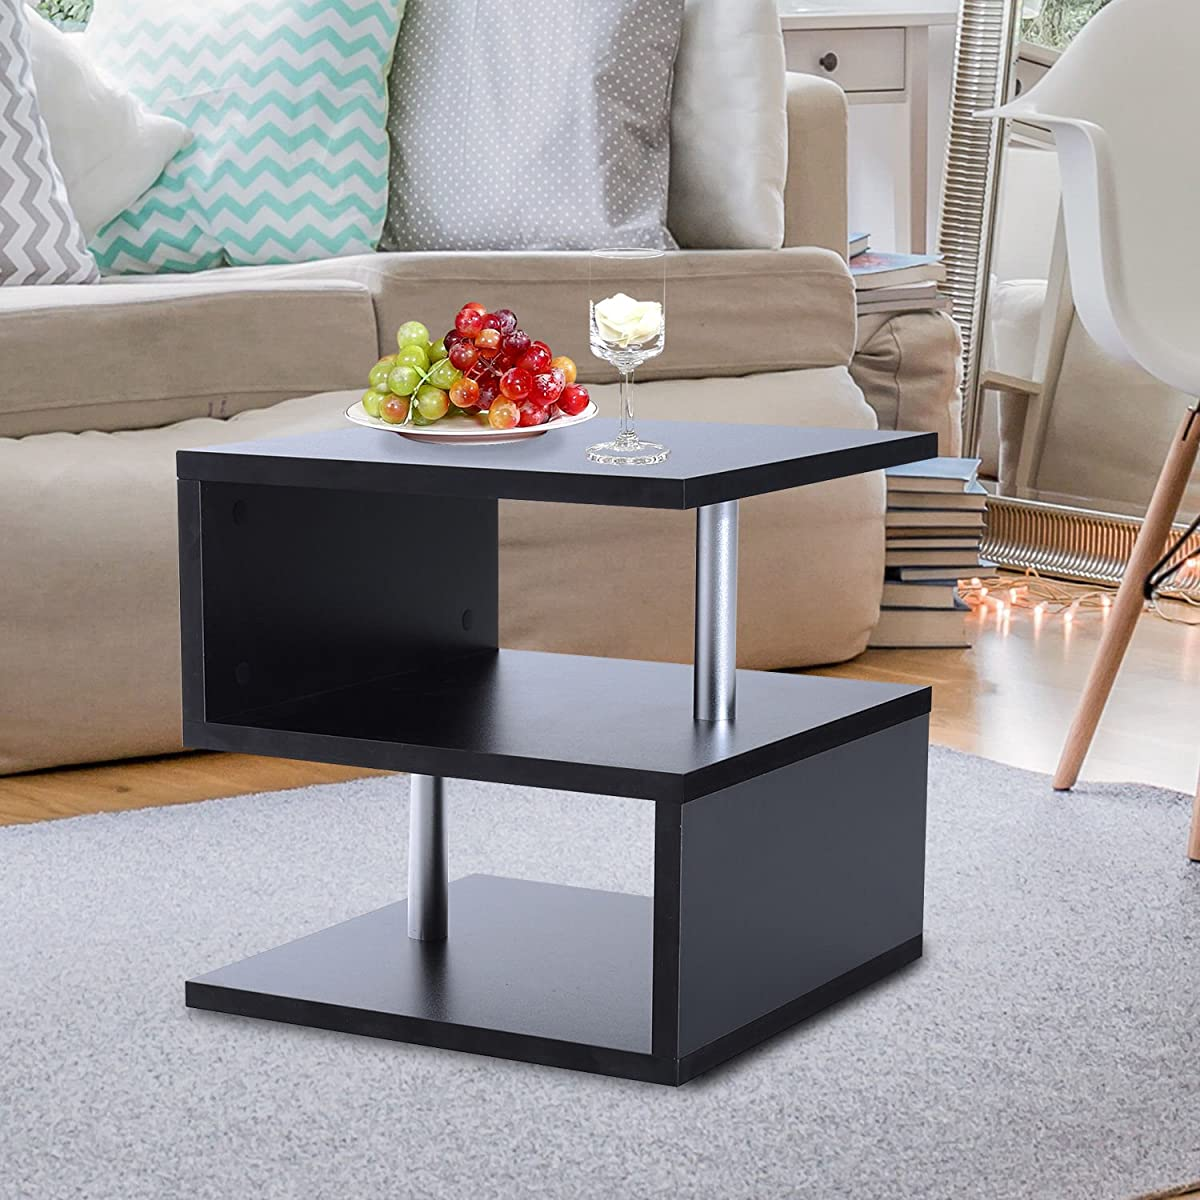 HomCom Modern Contemporary Multi Level S-Shaped End Table (Black)